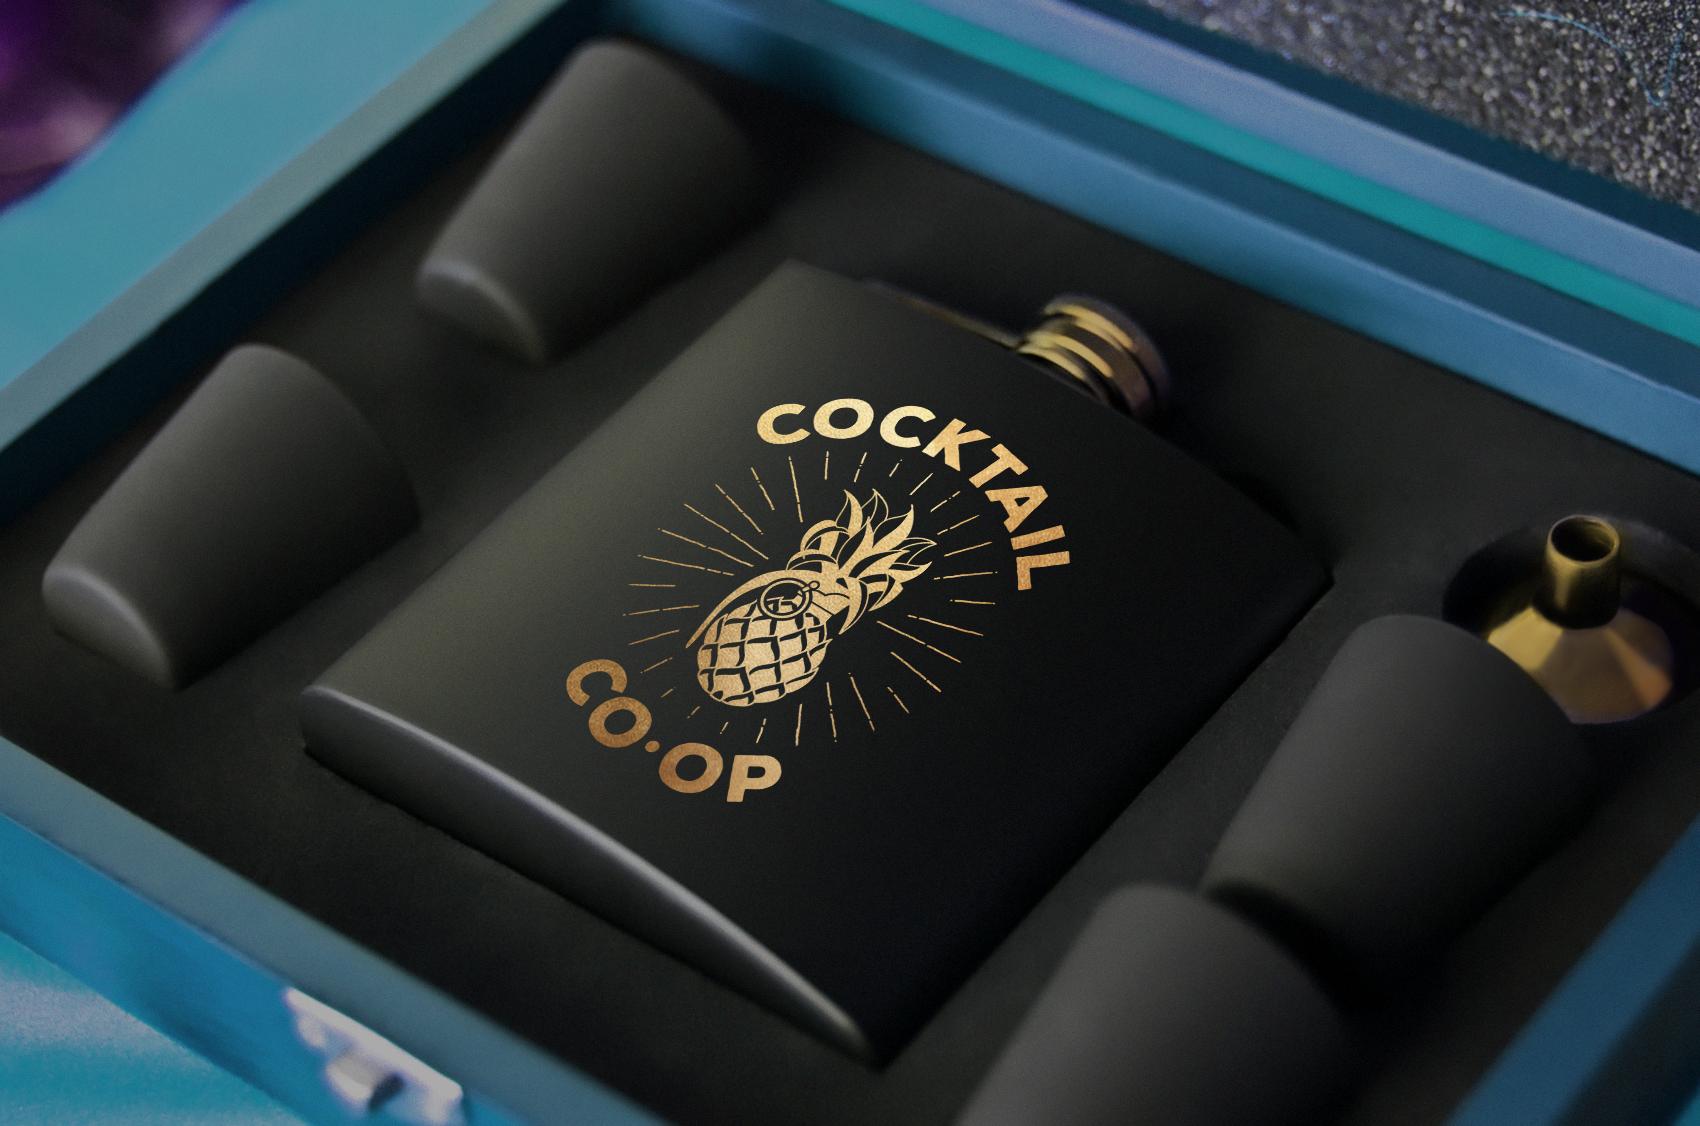 CocktailCoop-Bottle.jpg